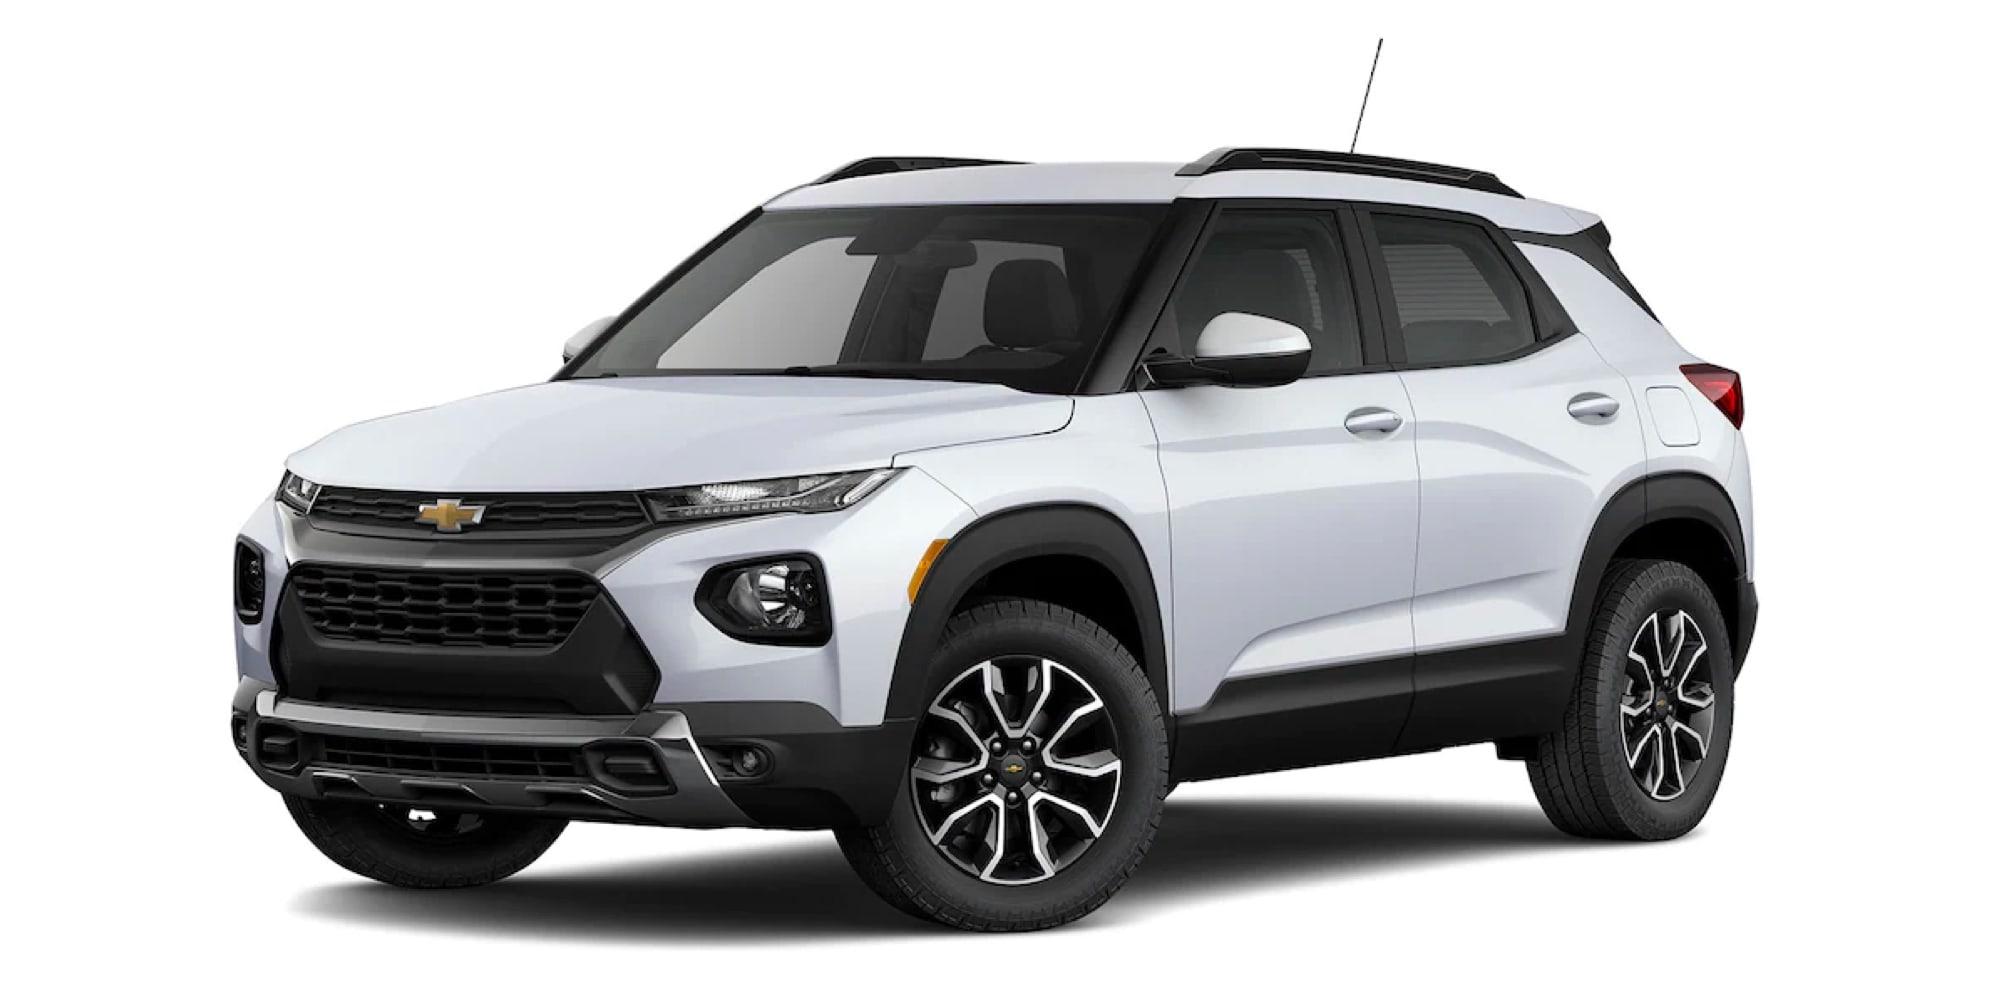 2022 Chevy Trailblazer in two-tone SUMMIT WHITE / SUMMIT WHITE